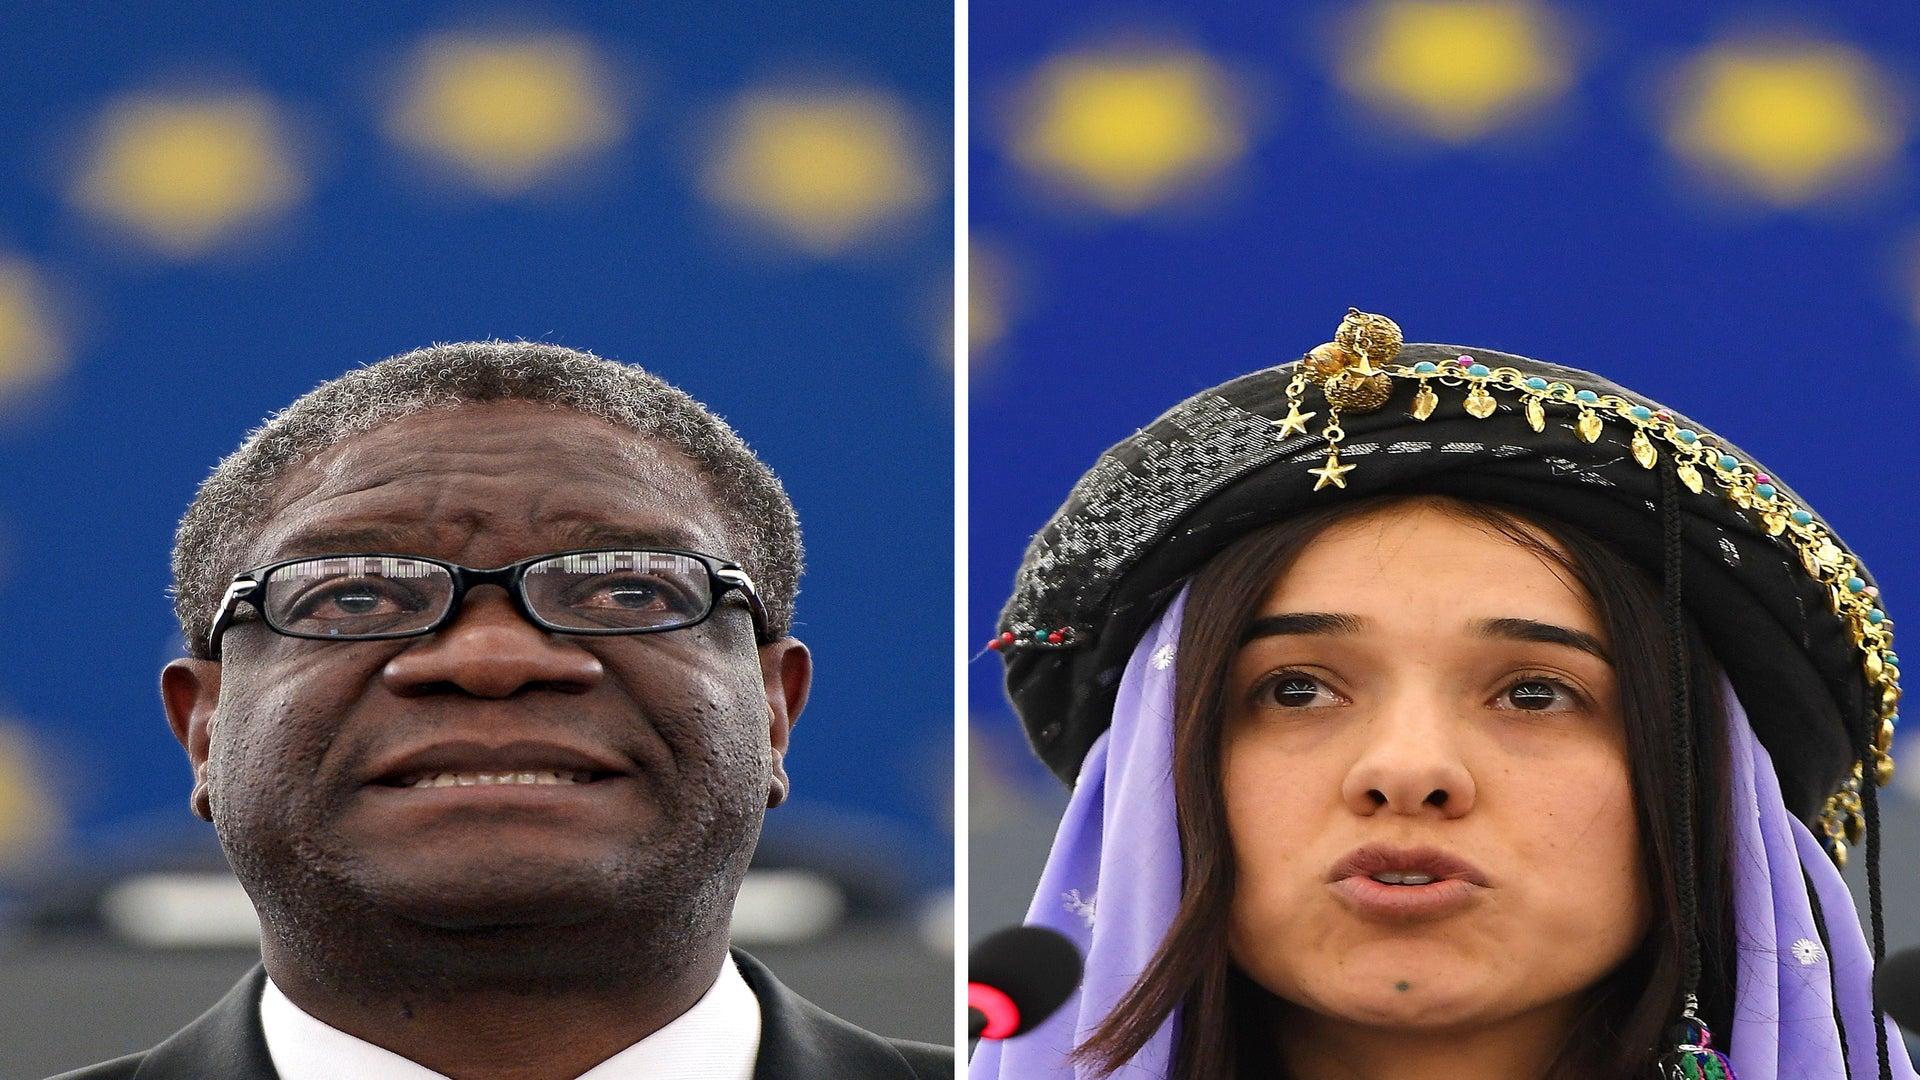 Denis Mukwege And Nadia Murad Win Nobel Peace Prize For Their Work Against Sexual Violence